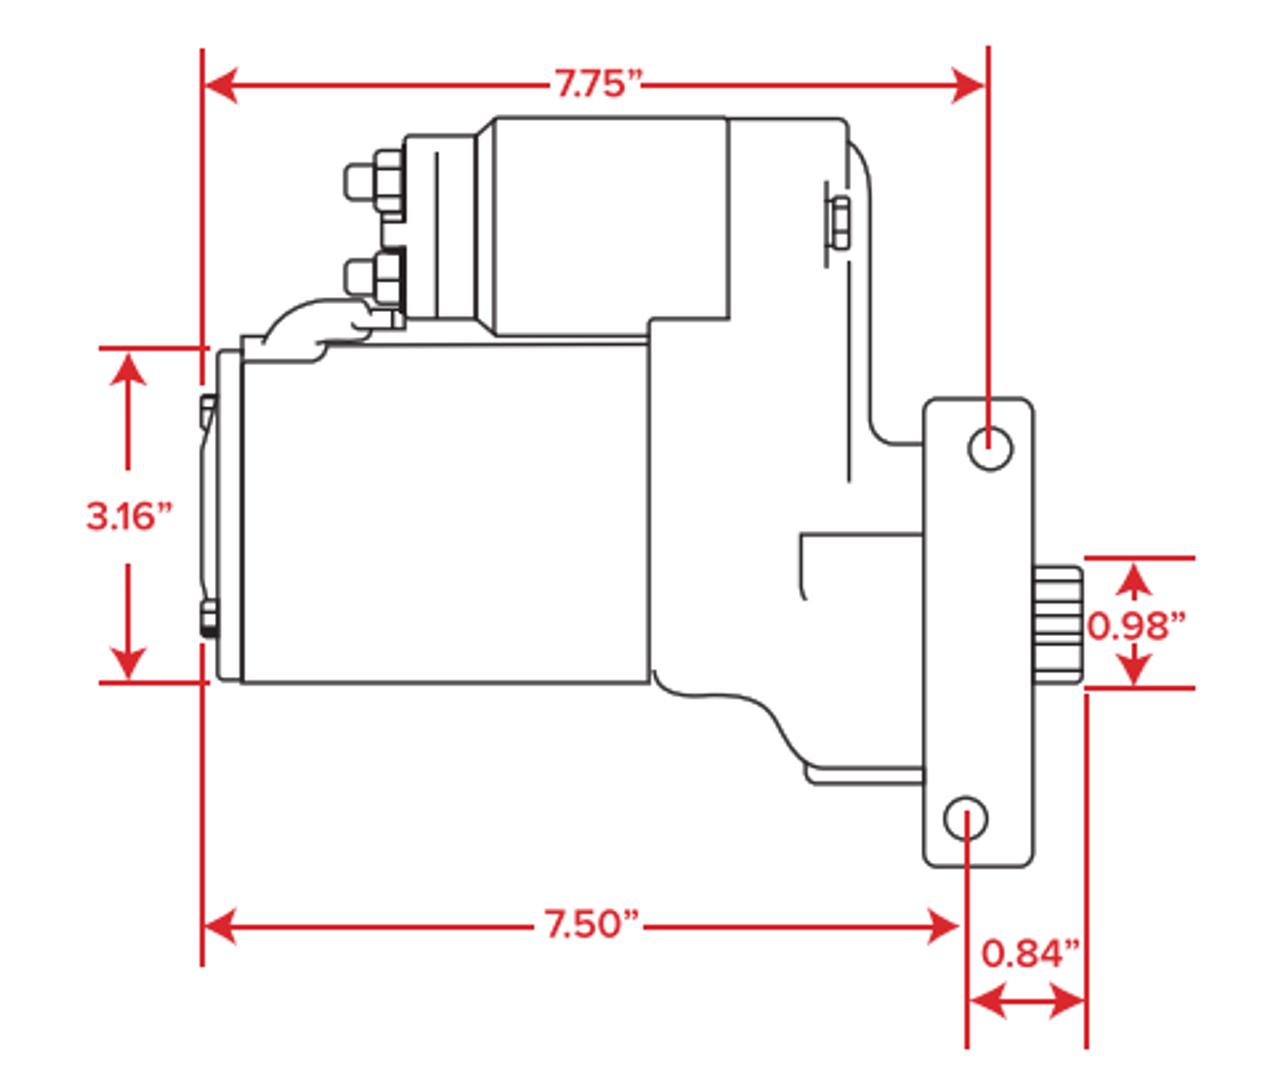 JM7002_Dimensions__64567.1507155190?c\=2 hurst shifter wiring diagram wiring diagrams hurst shifter wiring diagram at arjmand.co